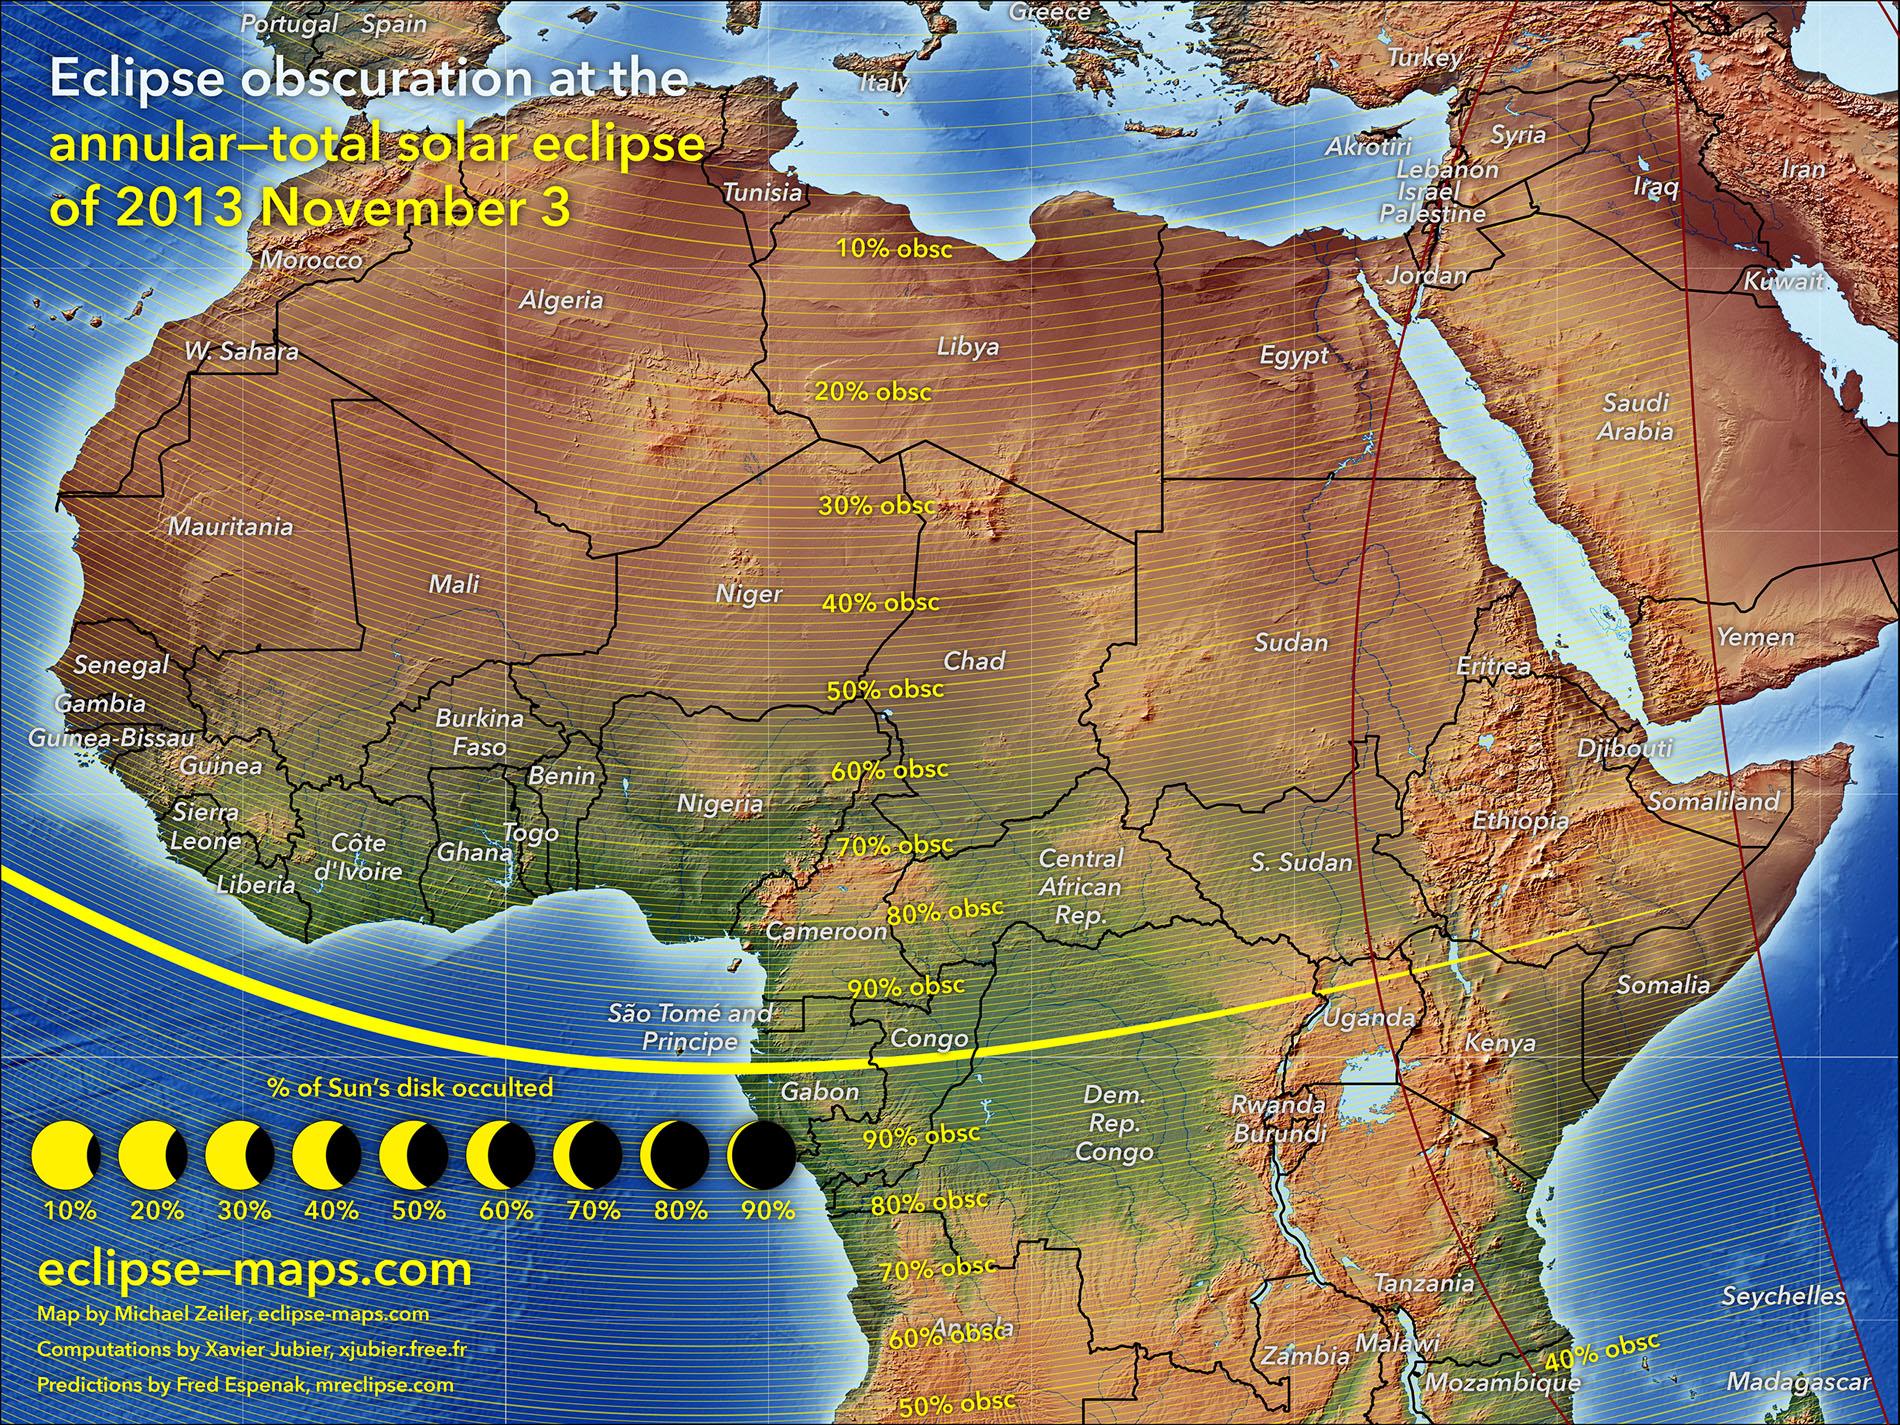 Nov. 3 Solar Eclipse: Africa Visibility